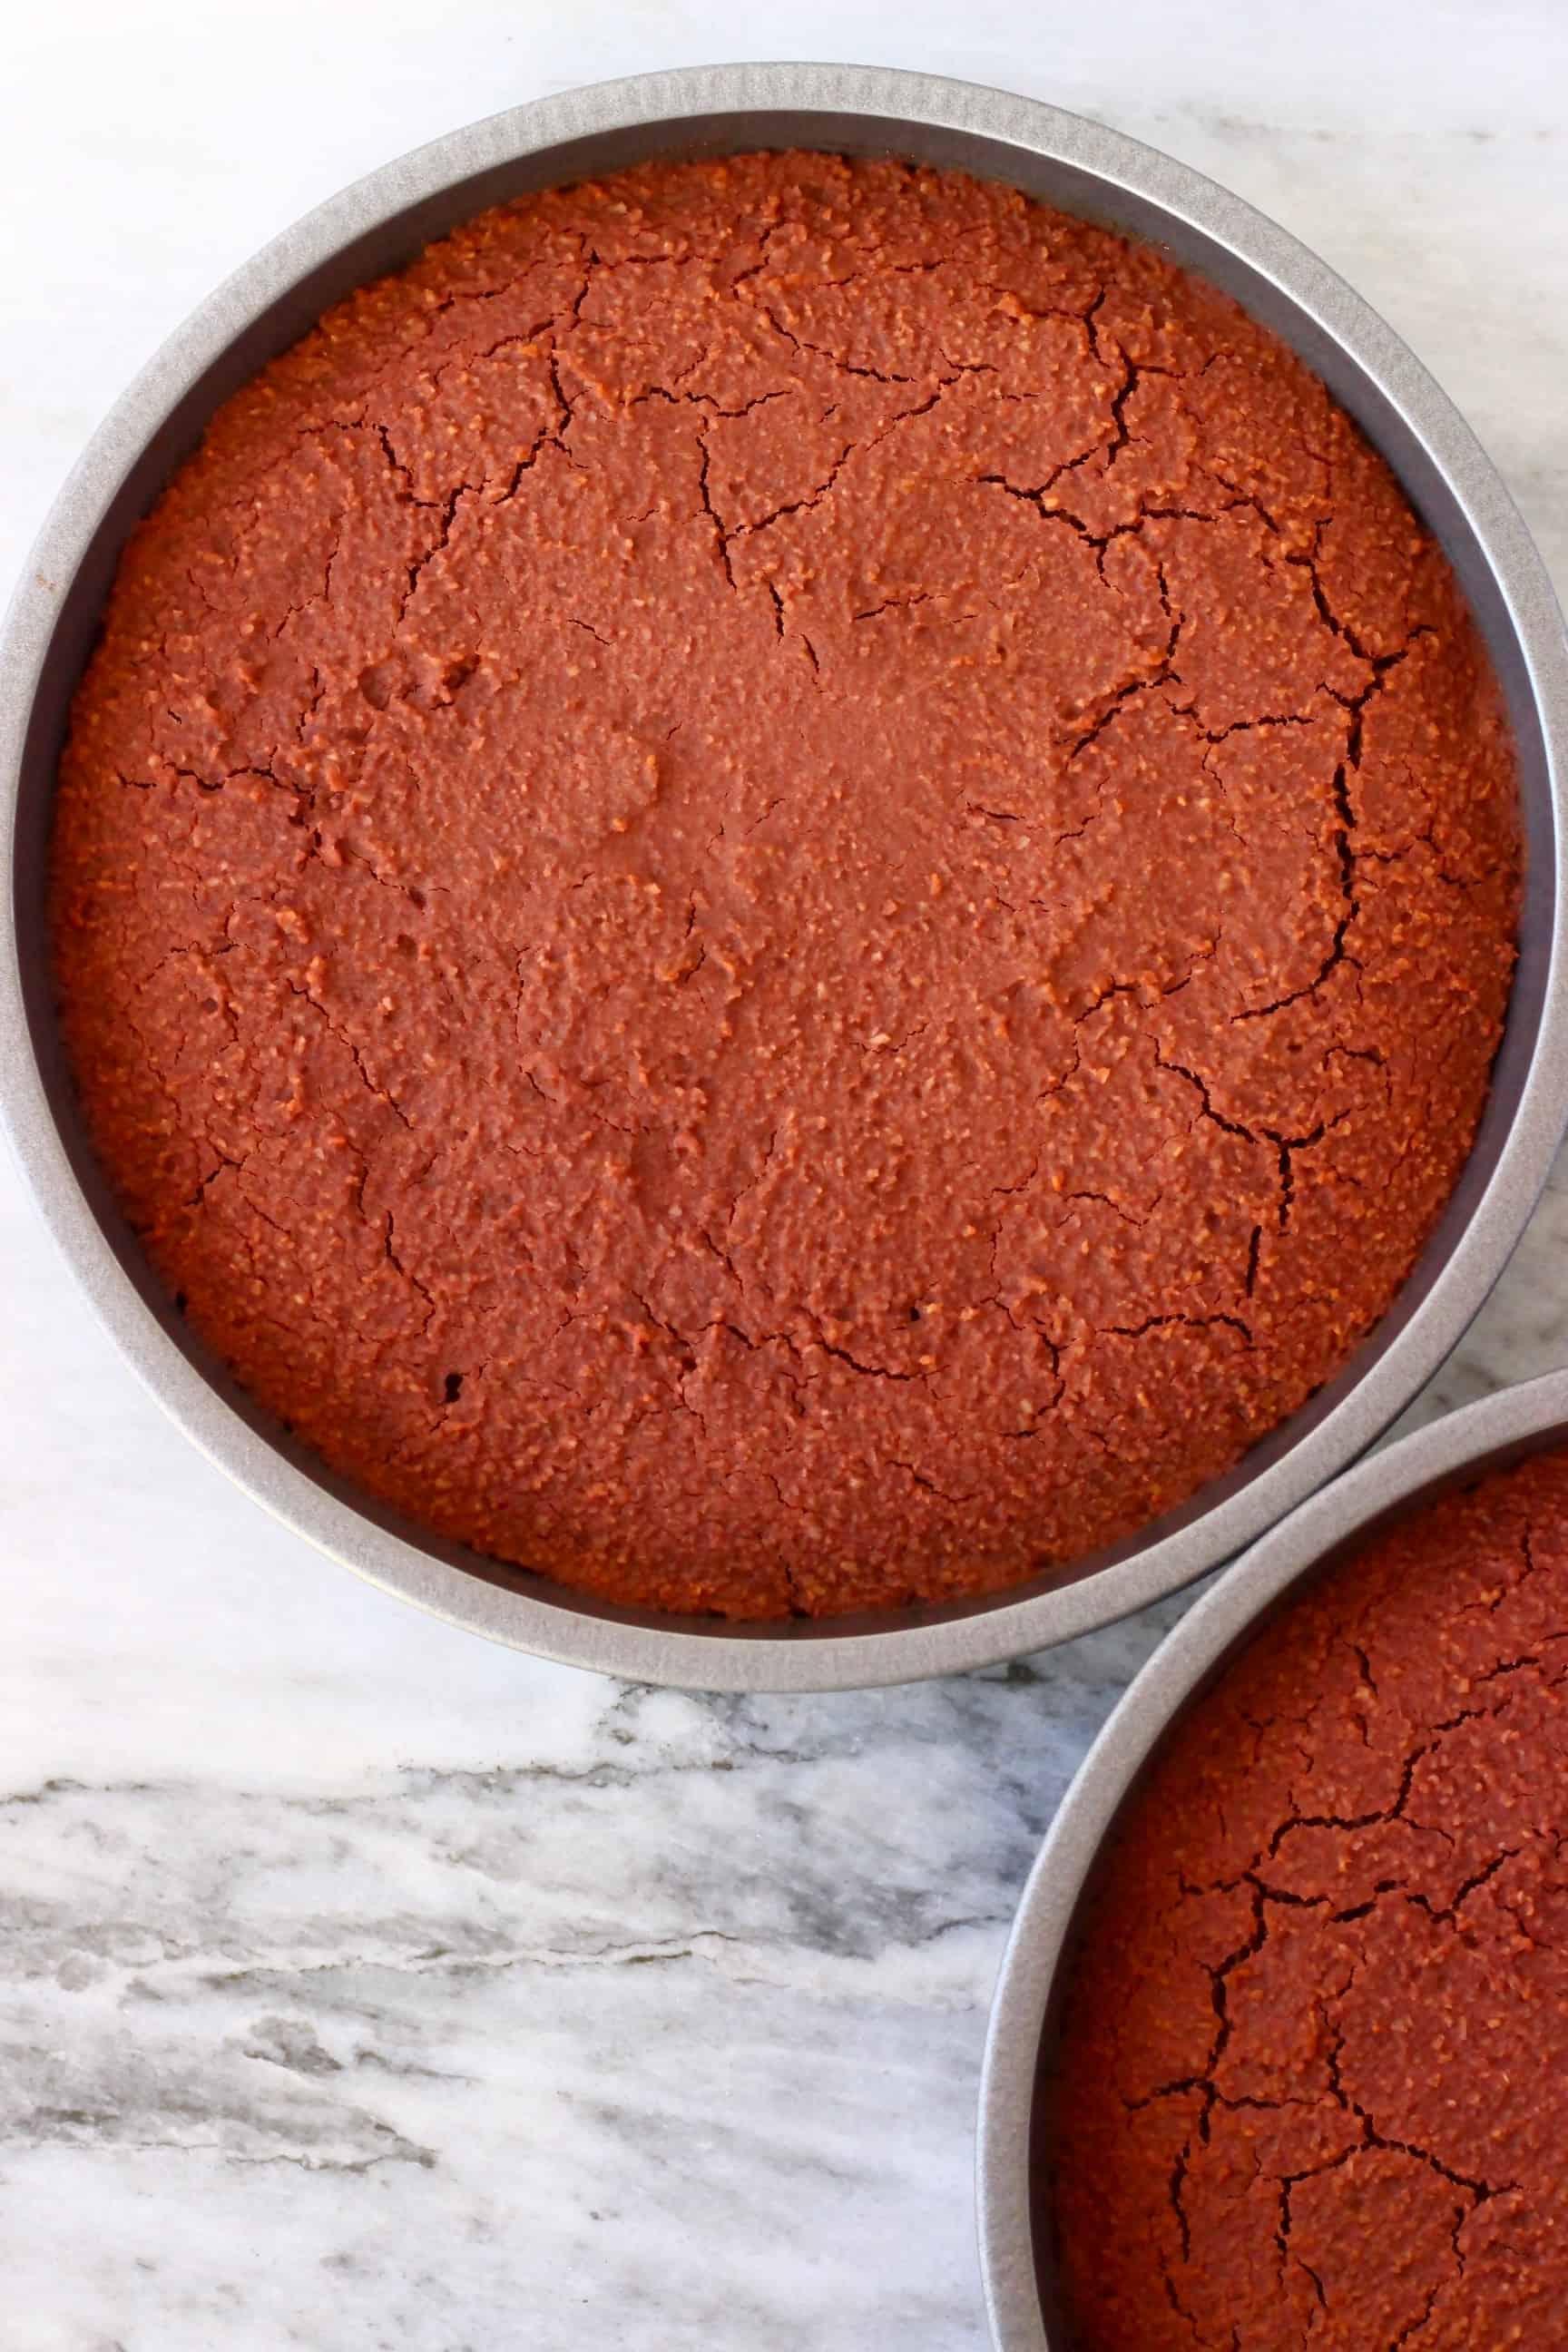 Two gluten-free vegan red velvet cake sponges in circular baking tins